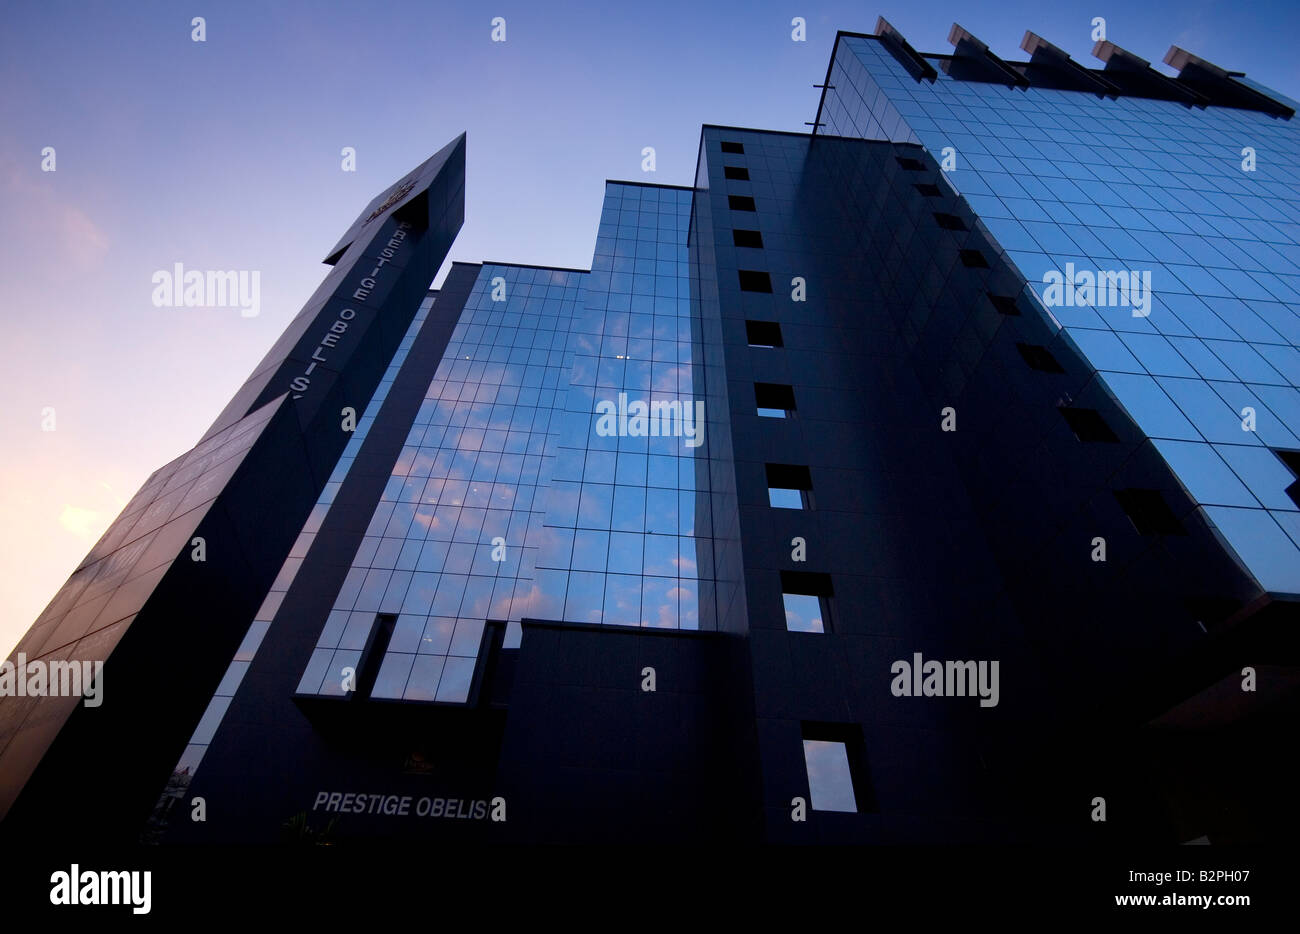 Modern Buildings, MG Road Area, Shanthala Nagar, Bengaluru (Bangalore), South Karnataka, India - Stock Image